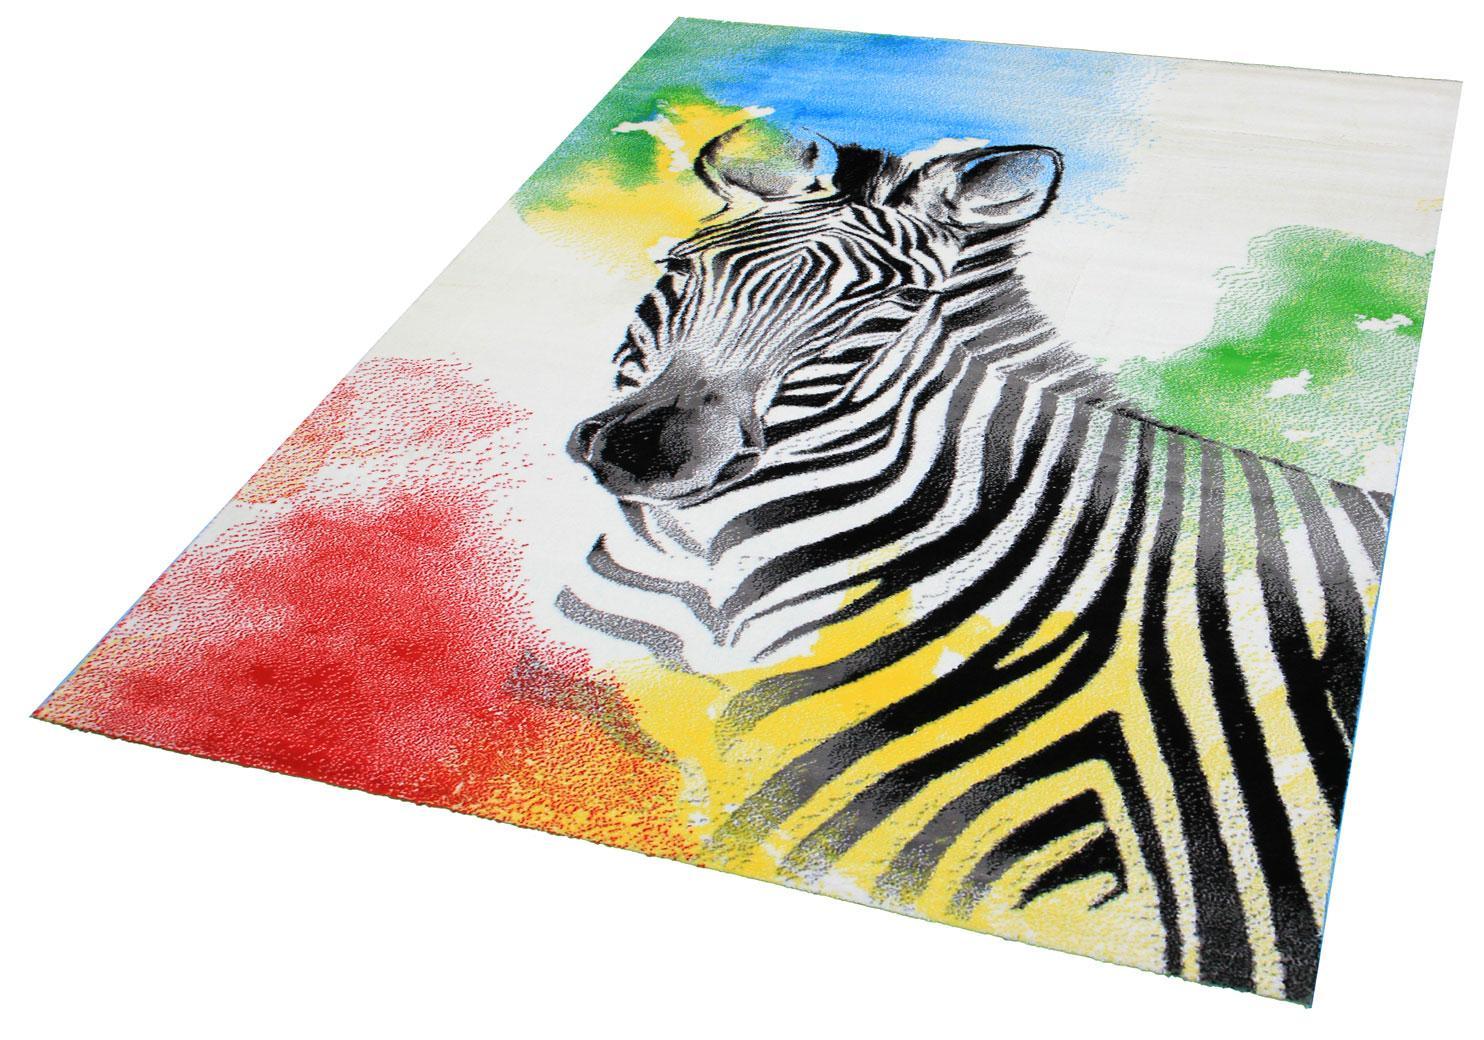 Kinderteppich Bambino 2106 Sanat Teppiche rechteckig Höhe 11 mm